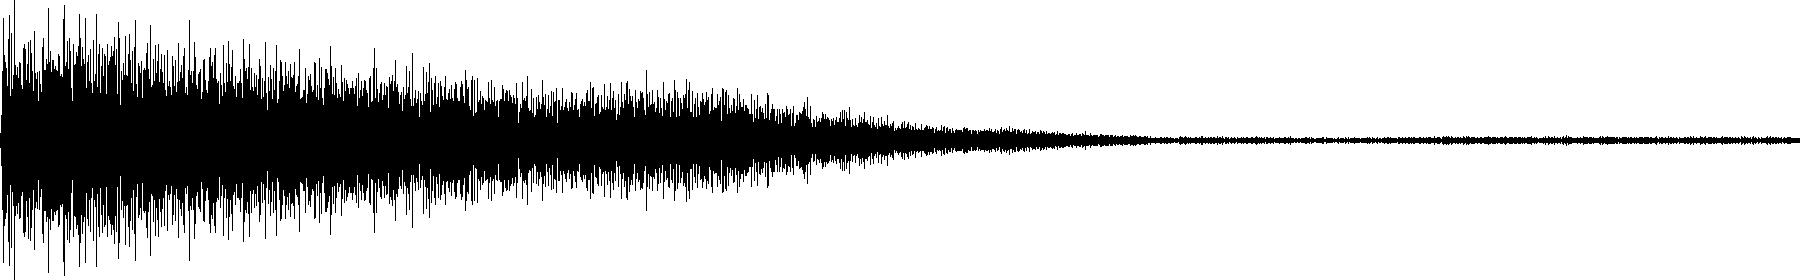 bluezone bc0210 percussion miscellaneous 006